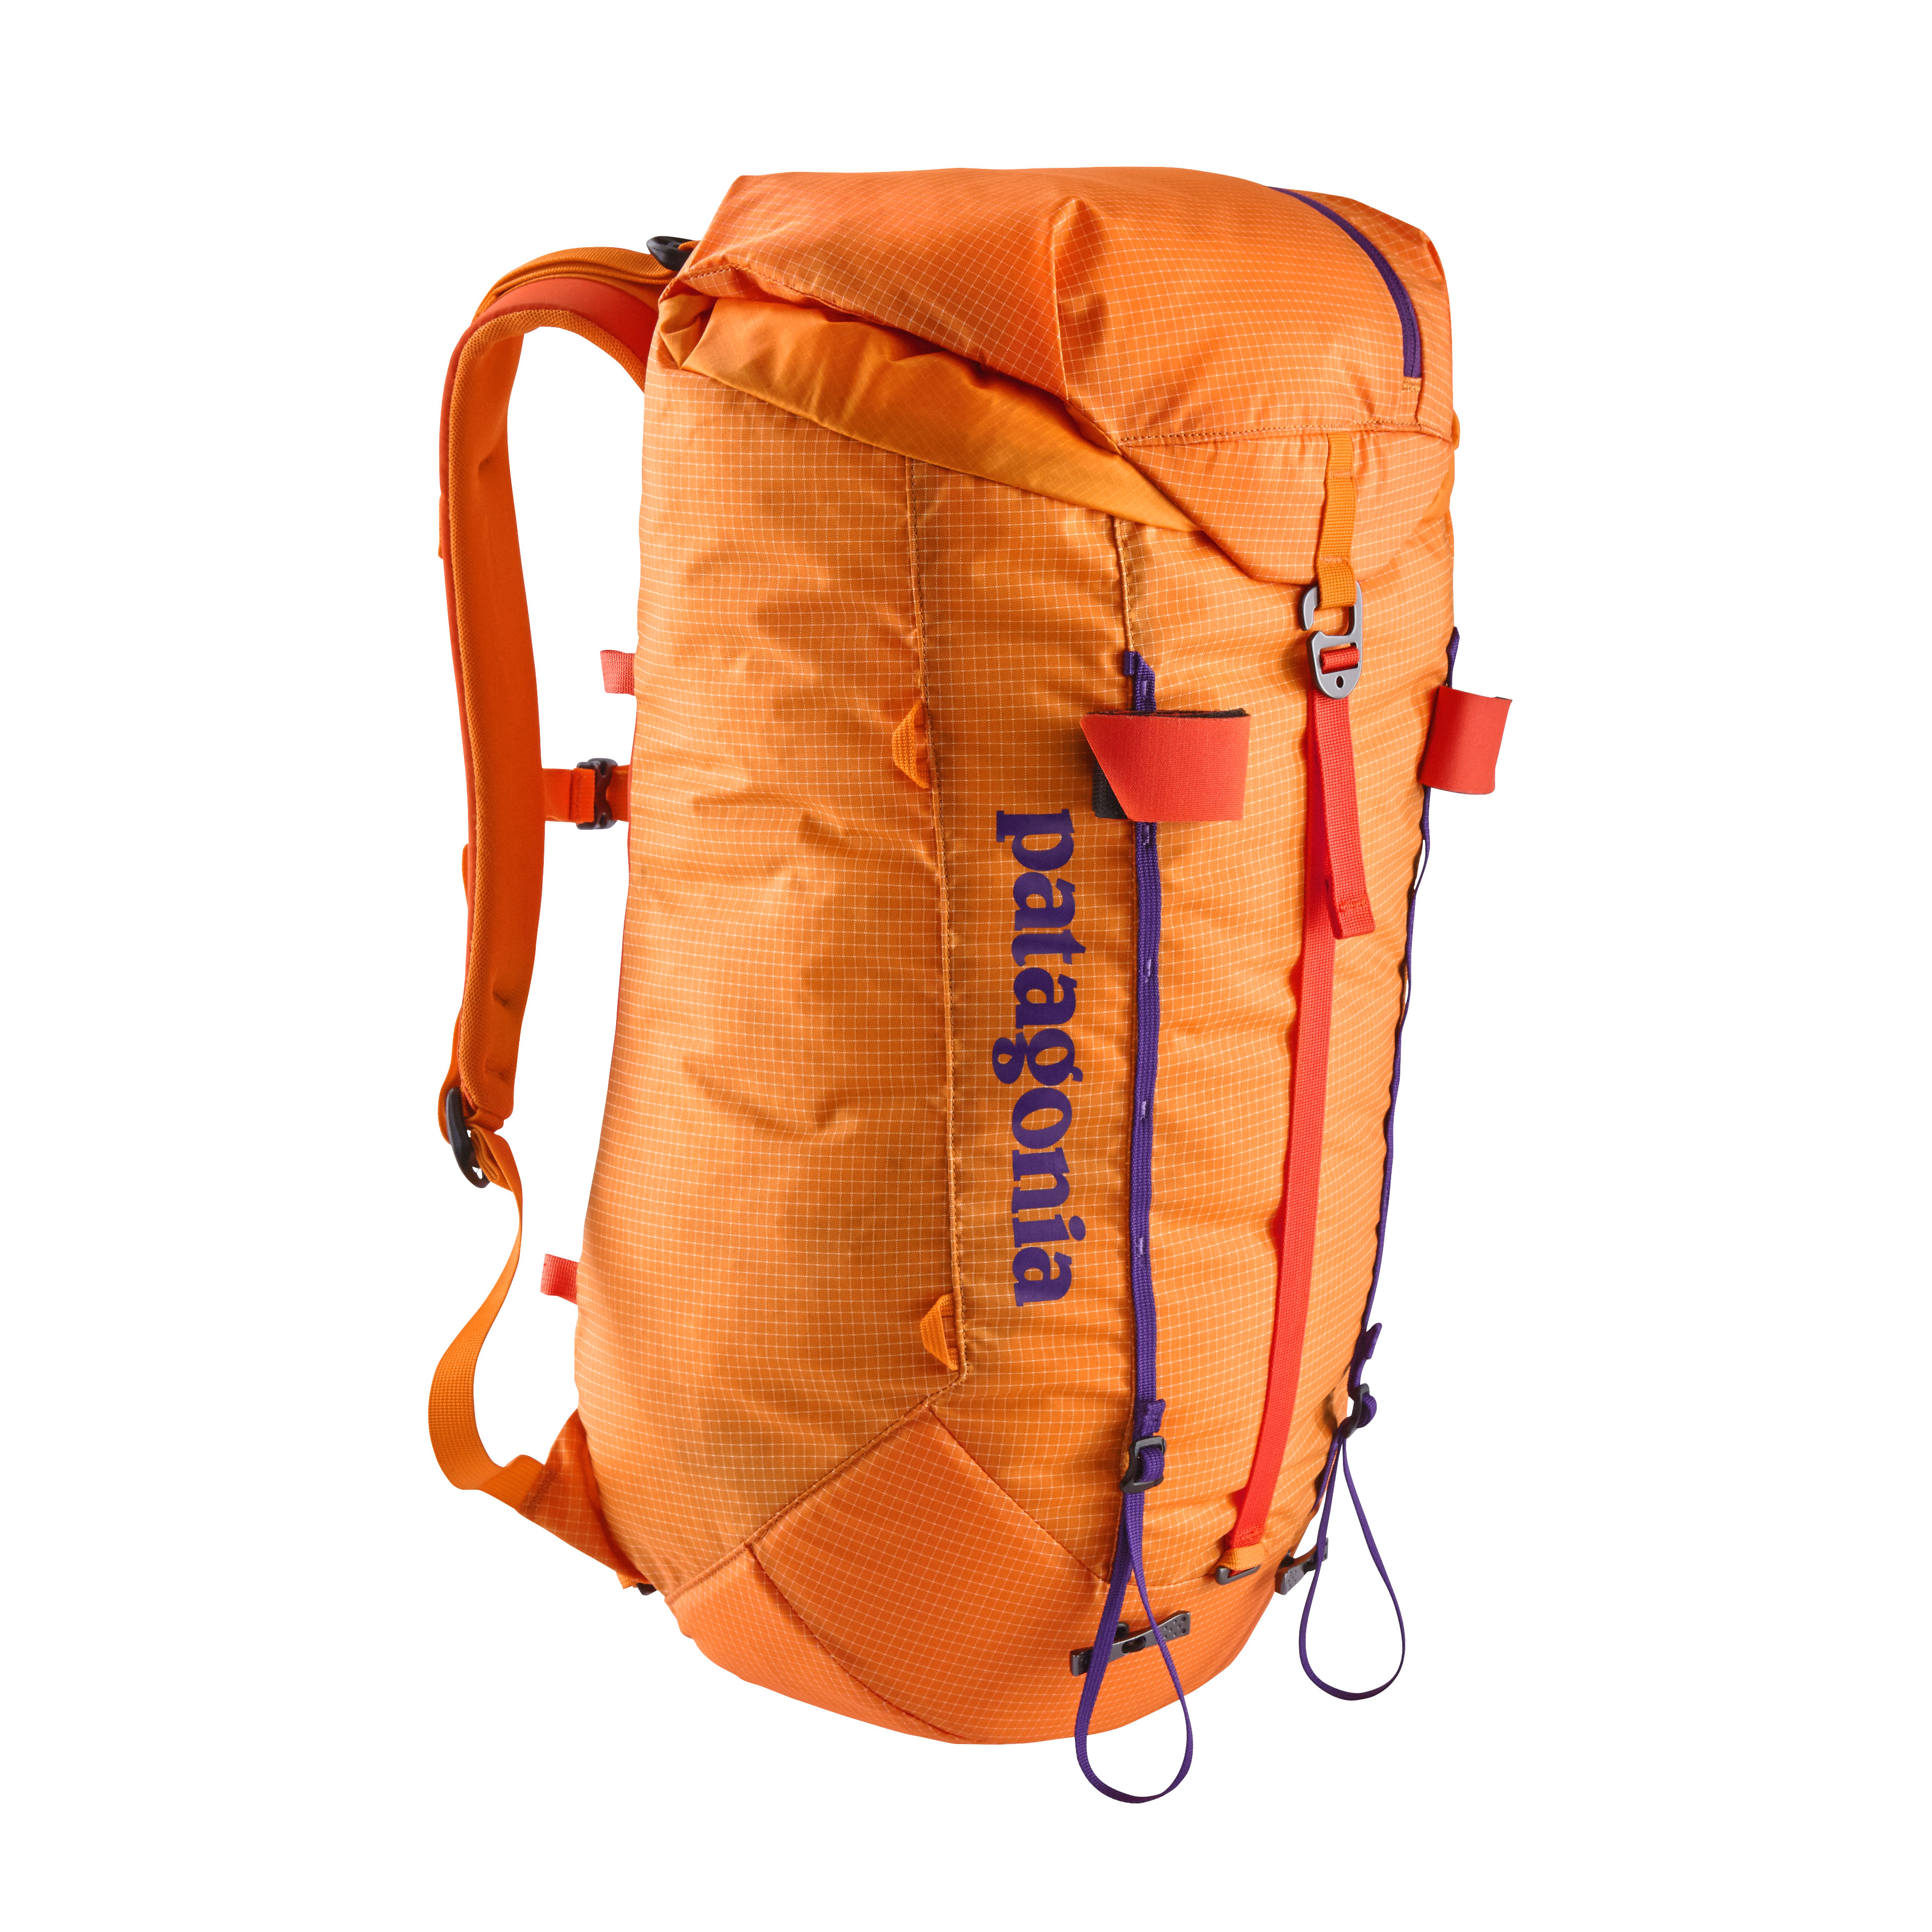 Patagonia Ascensionist Pack 30 L - Sac à dos